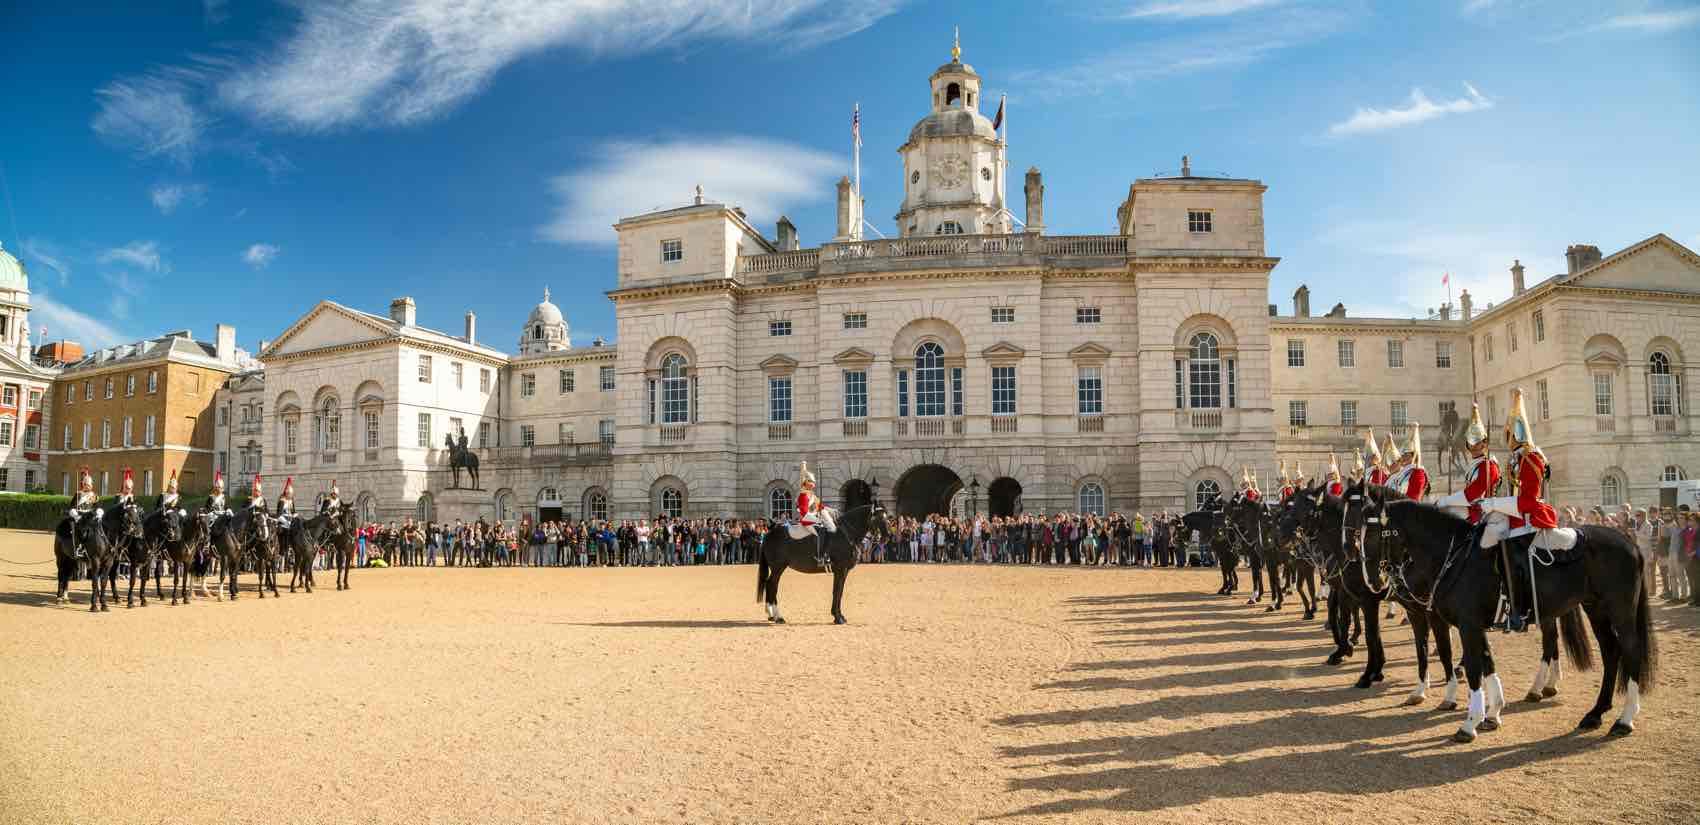 Horseguards Parade at Buckingham Palace